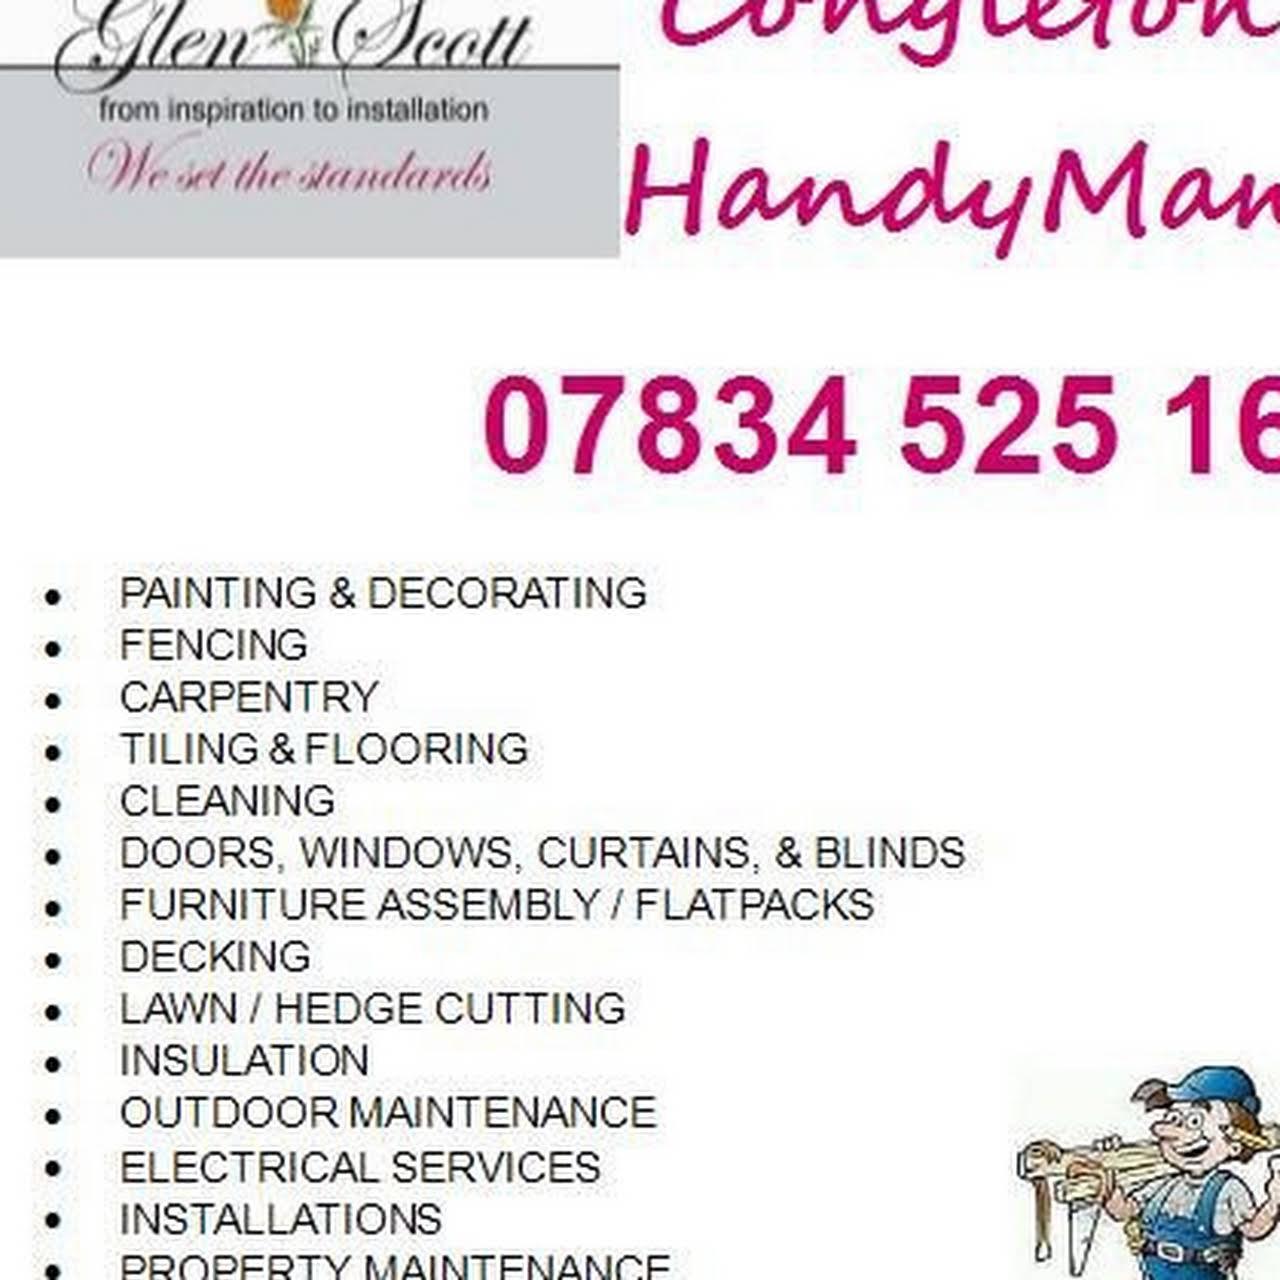 GlenScott HandyMan Congleton - Local Handyman & Property